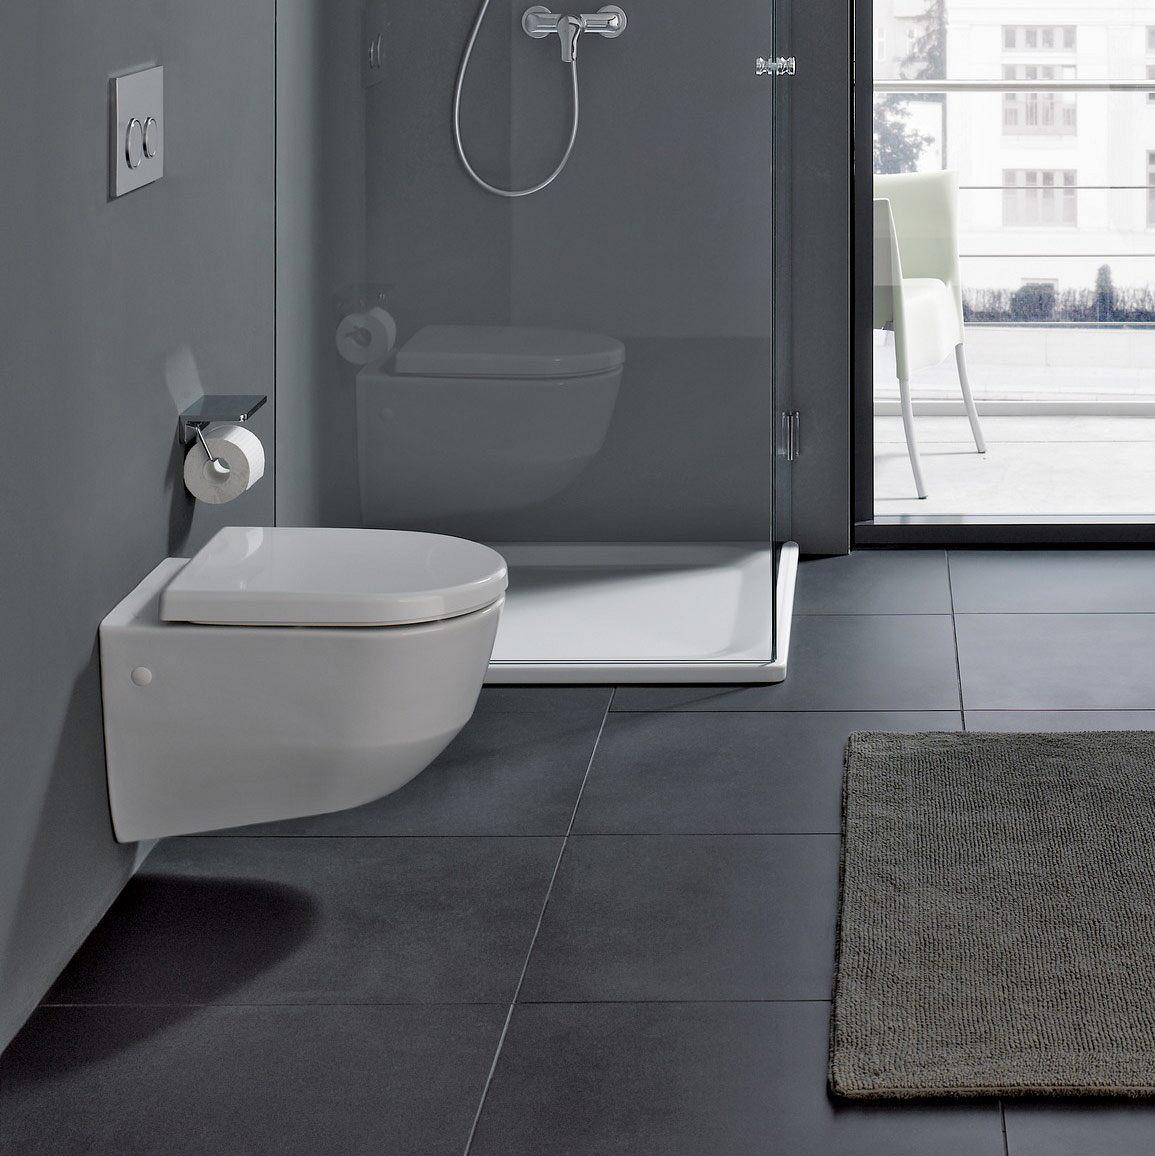 laufen pro compact wand wc tiefsp ler 8209650000001 megabad. Black Bedroom Furniture Sets. Home Design Ideas